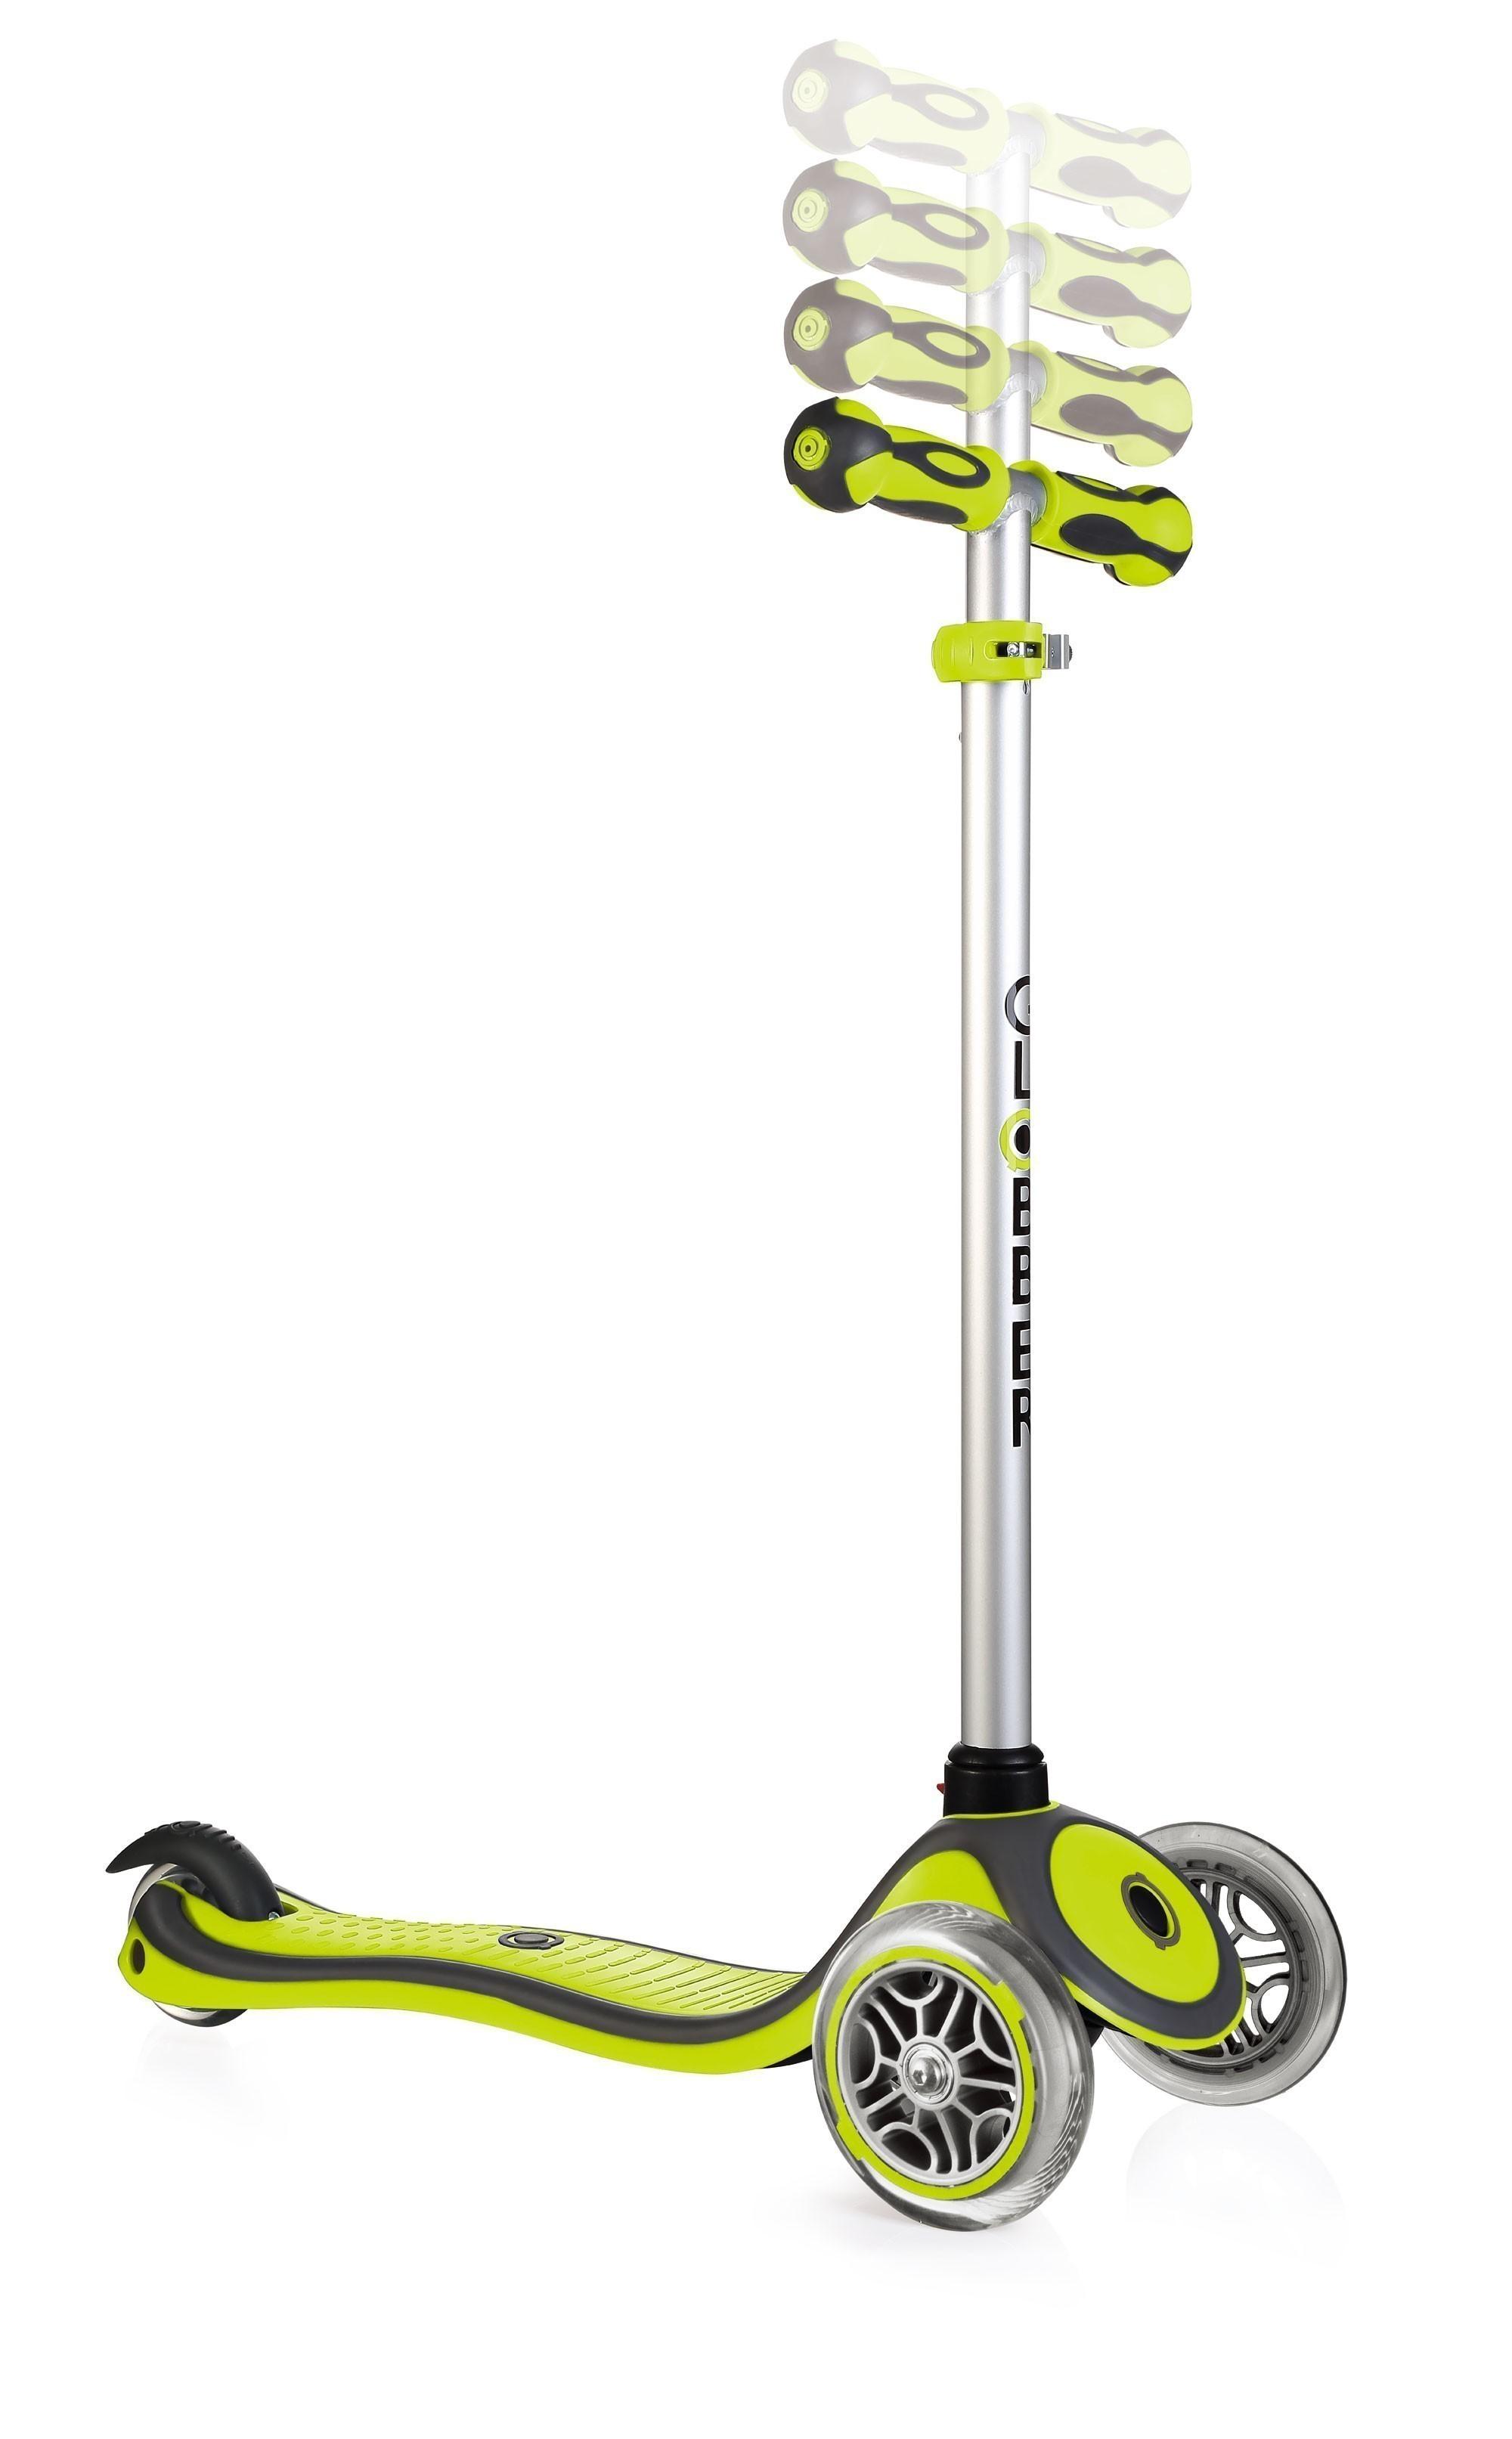 Scooter / Kinderroller Globber Primo Plus grün Bild 2